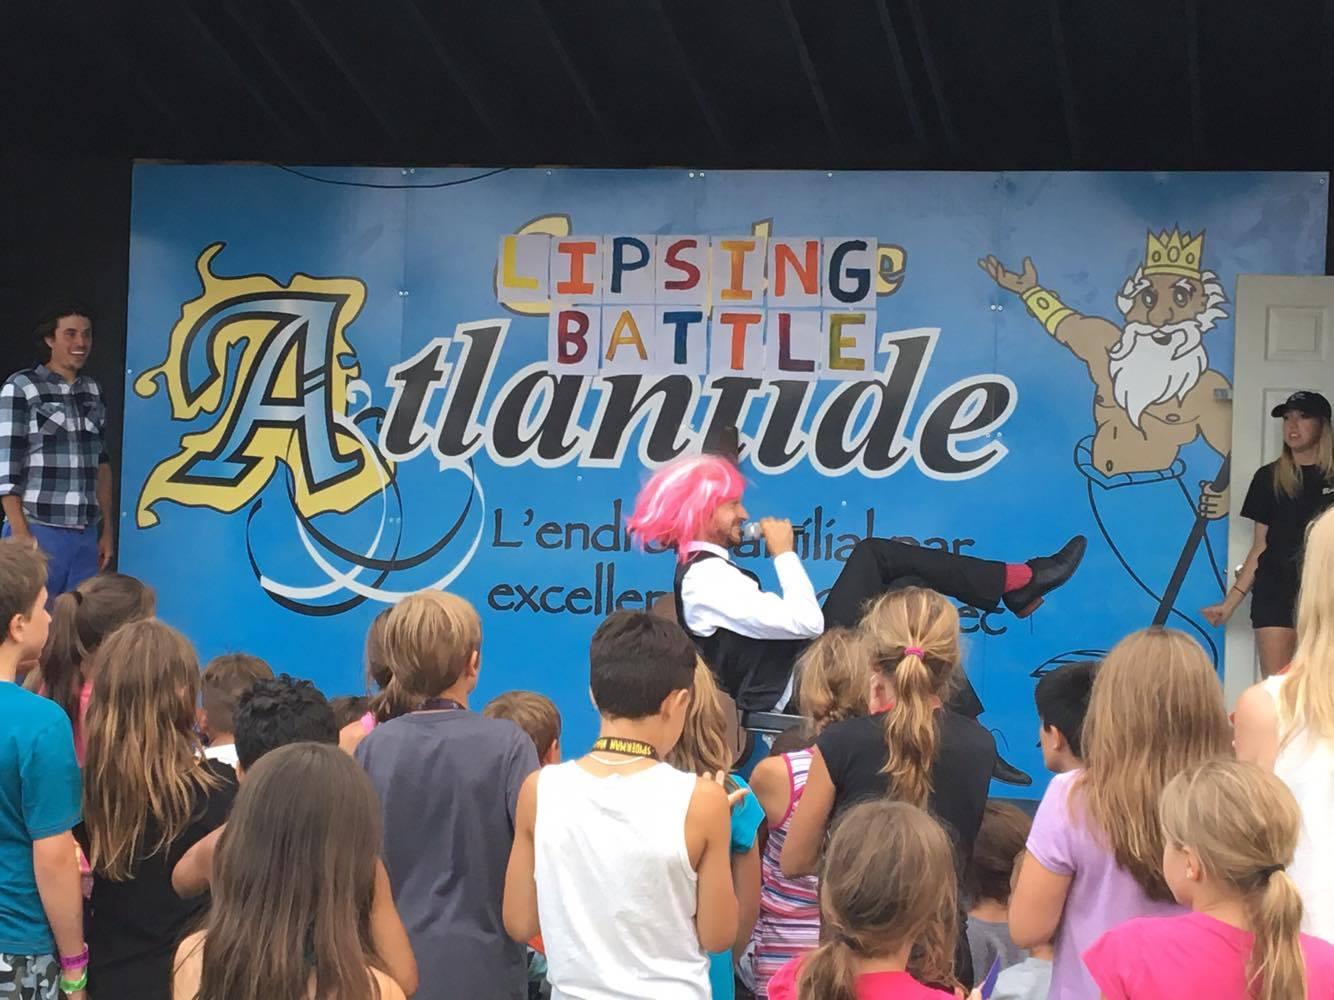 http://www.campingatlantide.com/wp-content/uploads/2017/08/lipsink-battle-complexe-atlantide-5.jpg